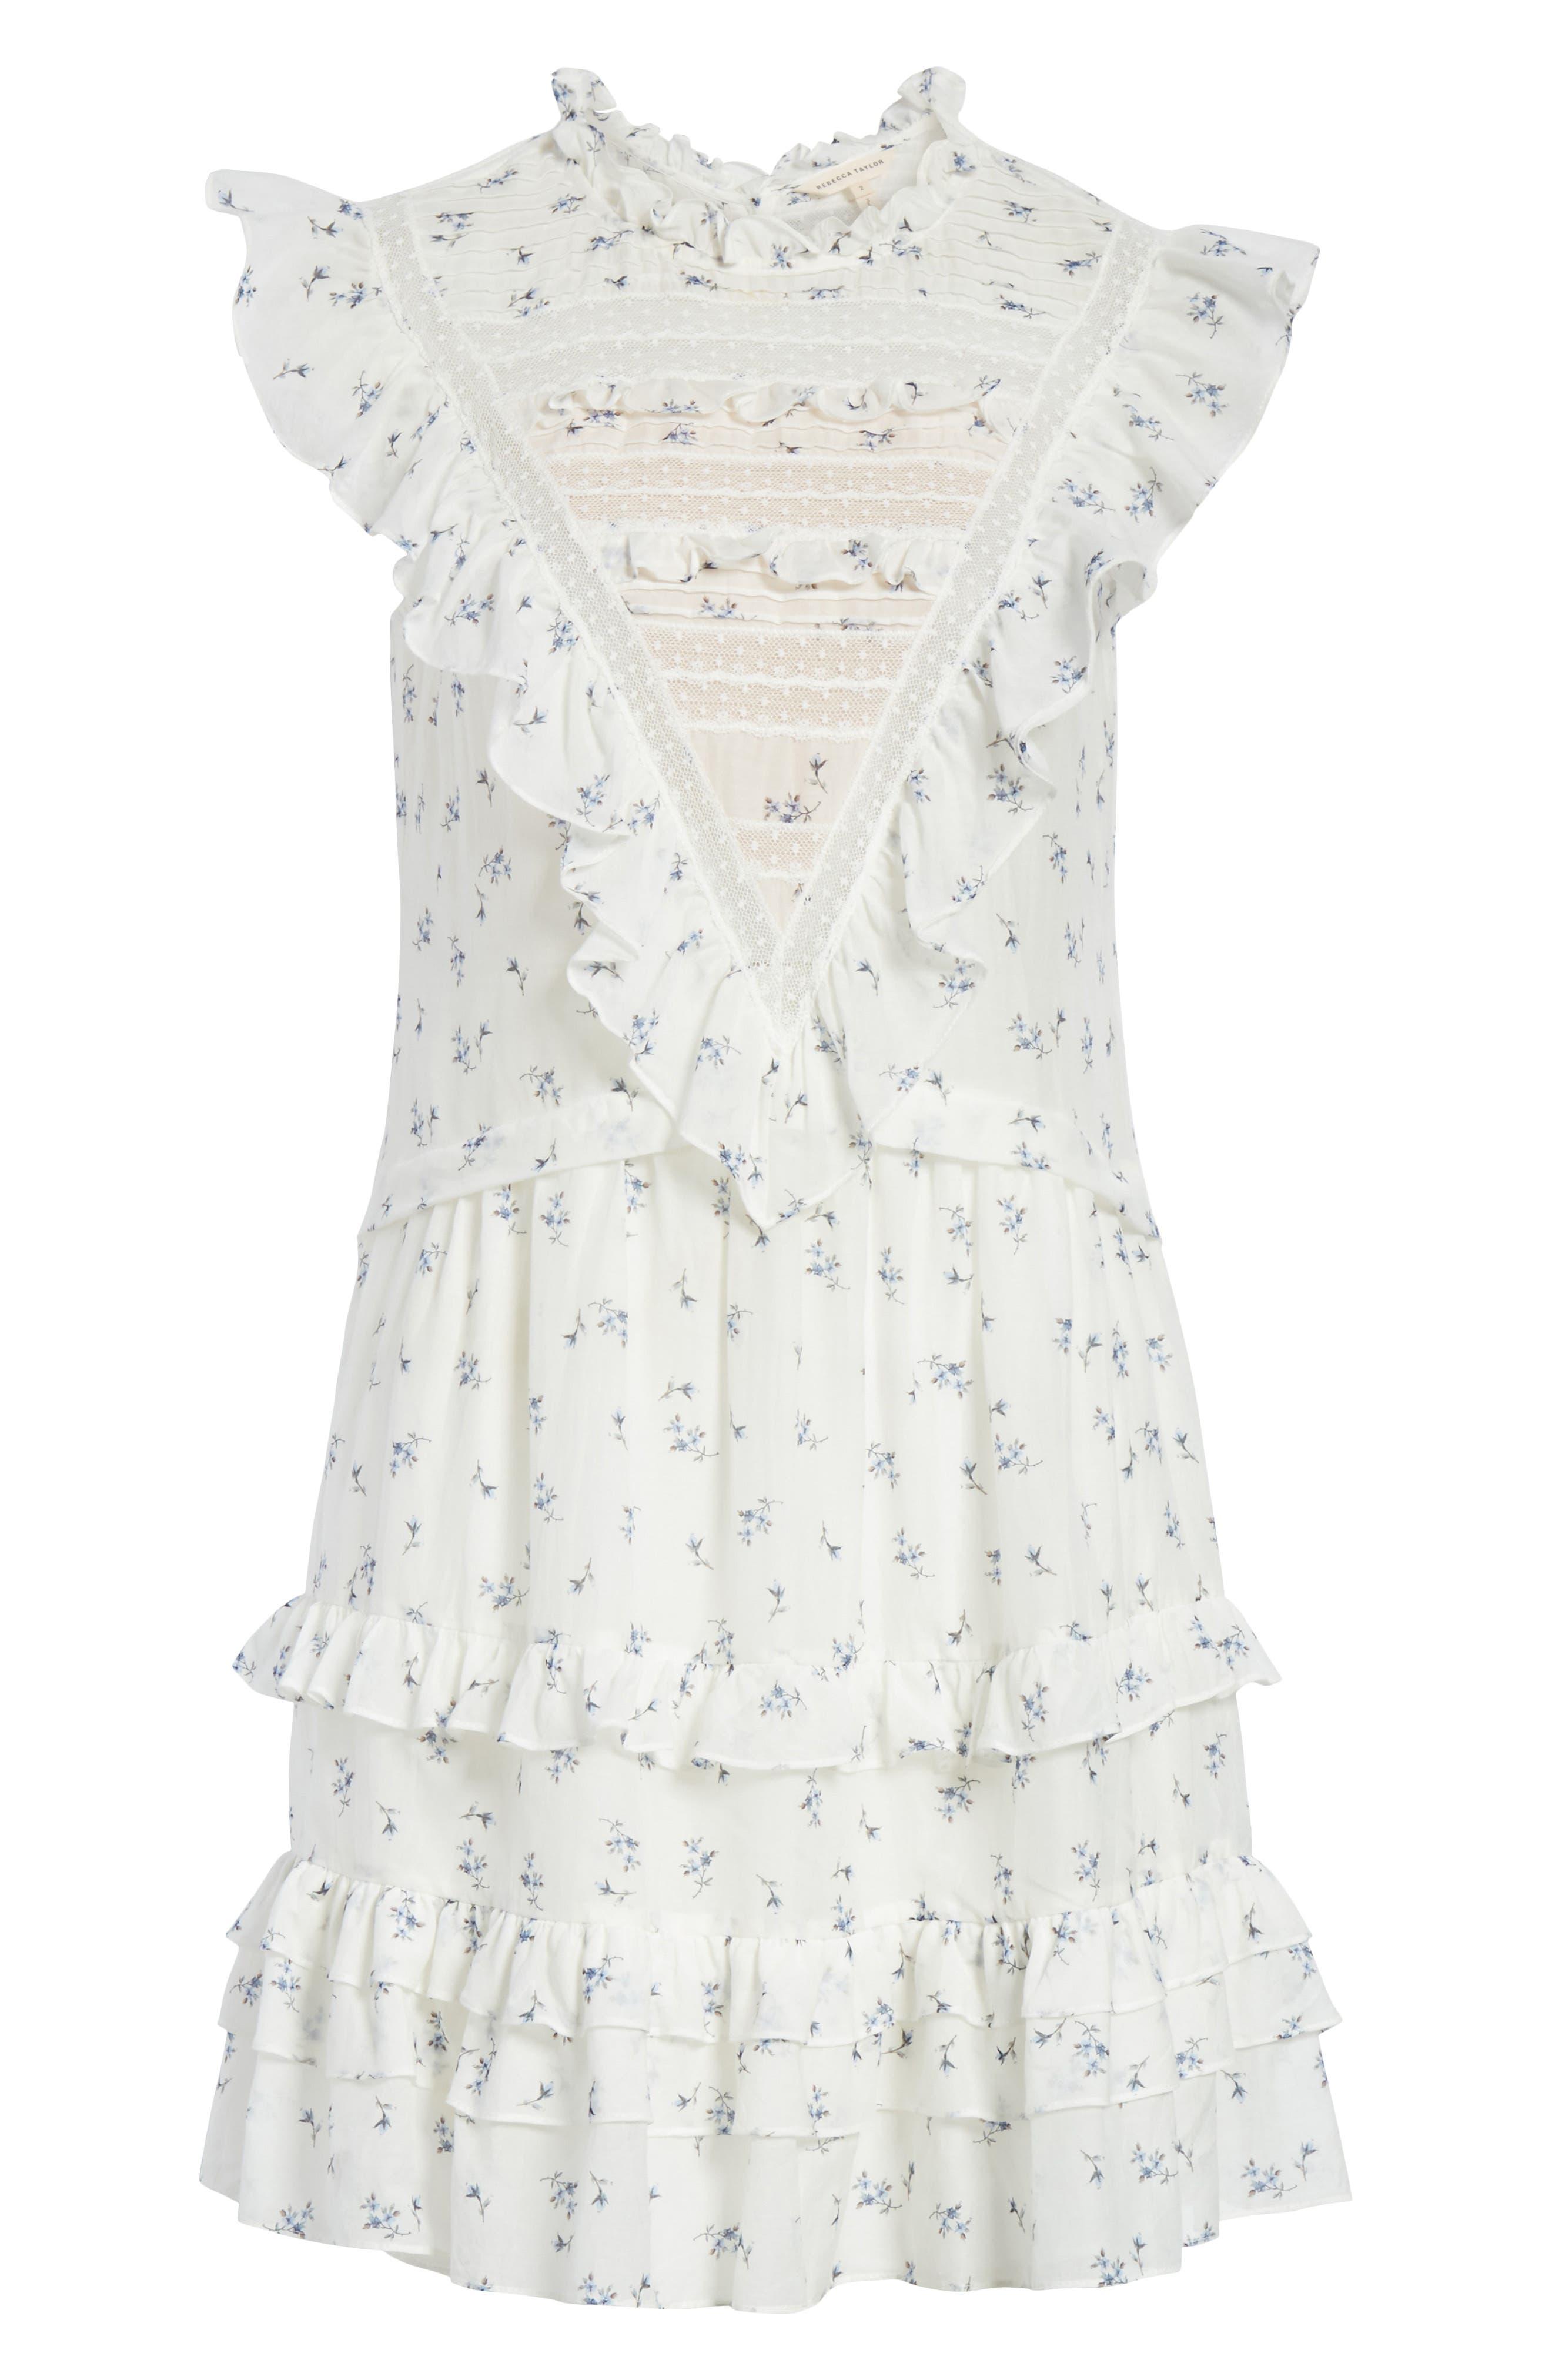 Floral Spring A-Line Dress,                             Alternate thumbnail 6, color,                             Snow Combo